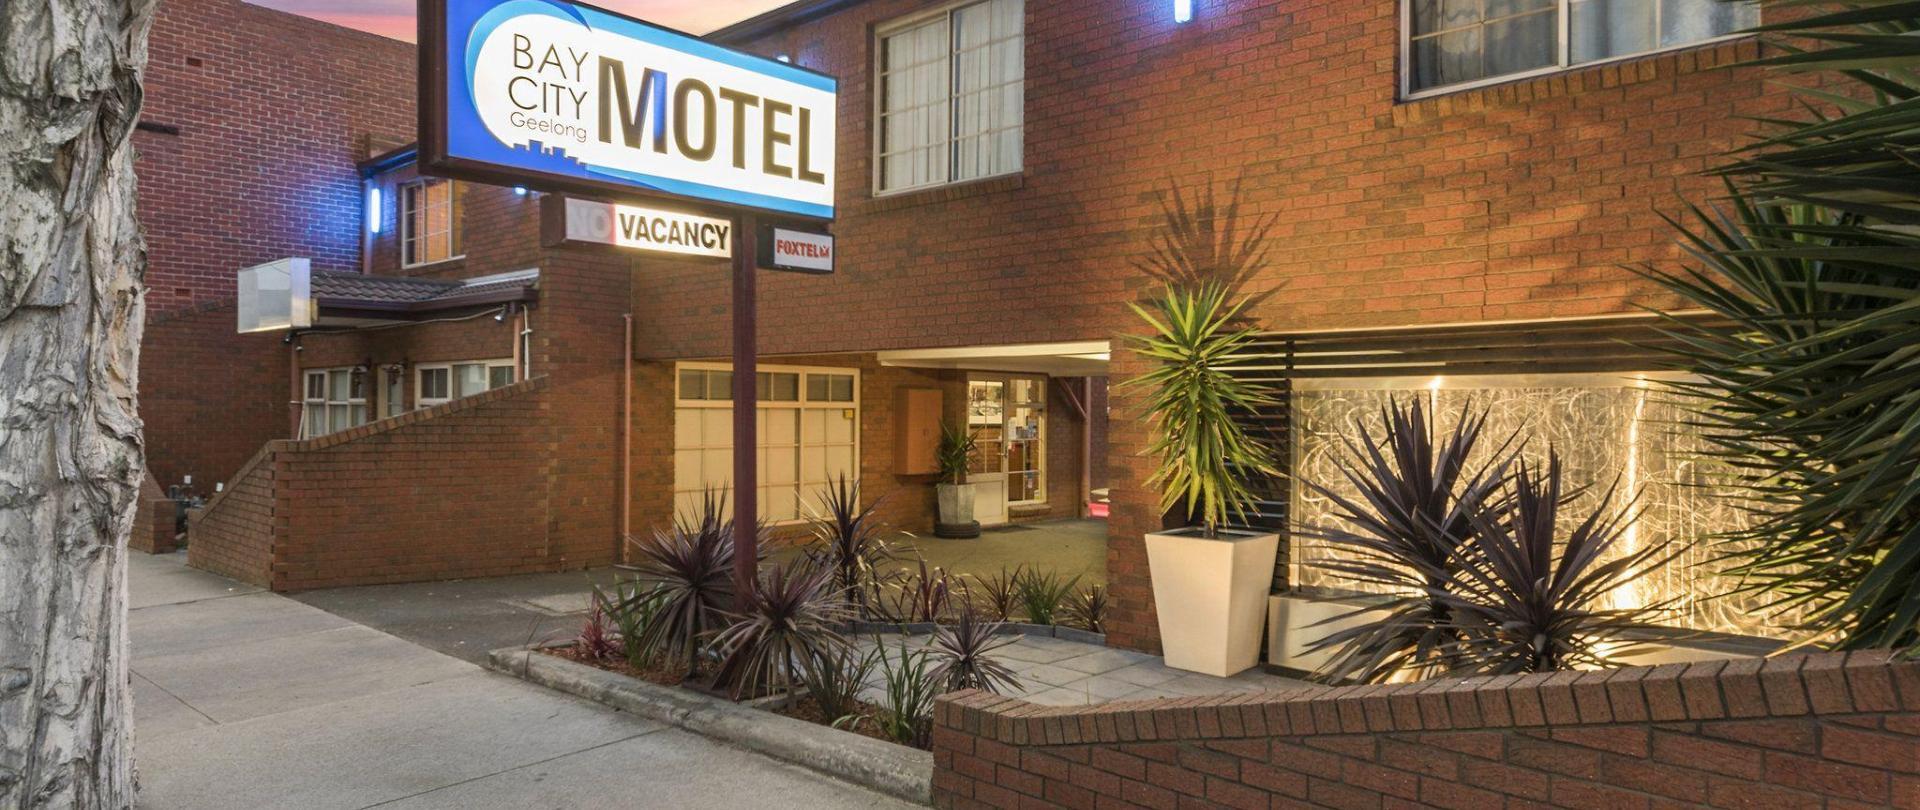 motel-front-1.jpg